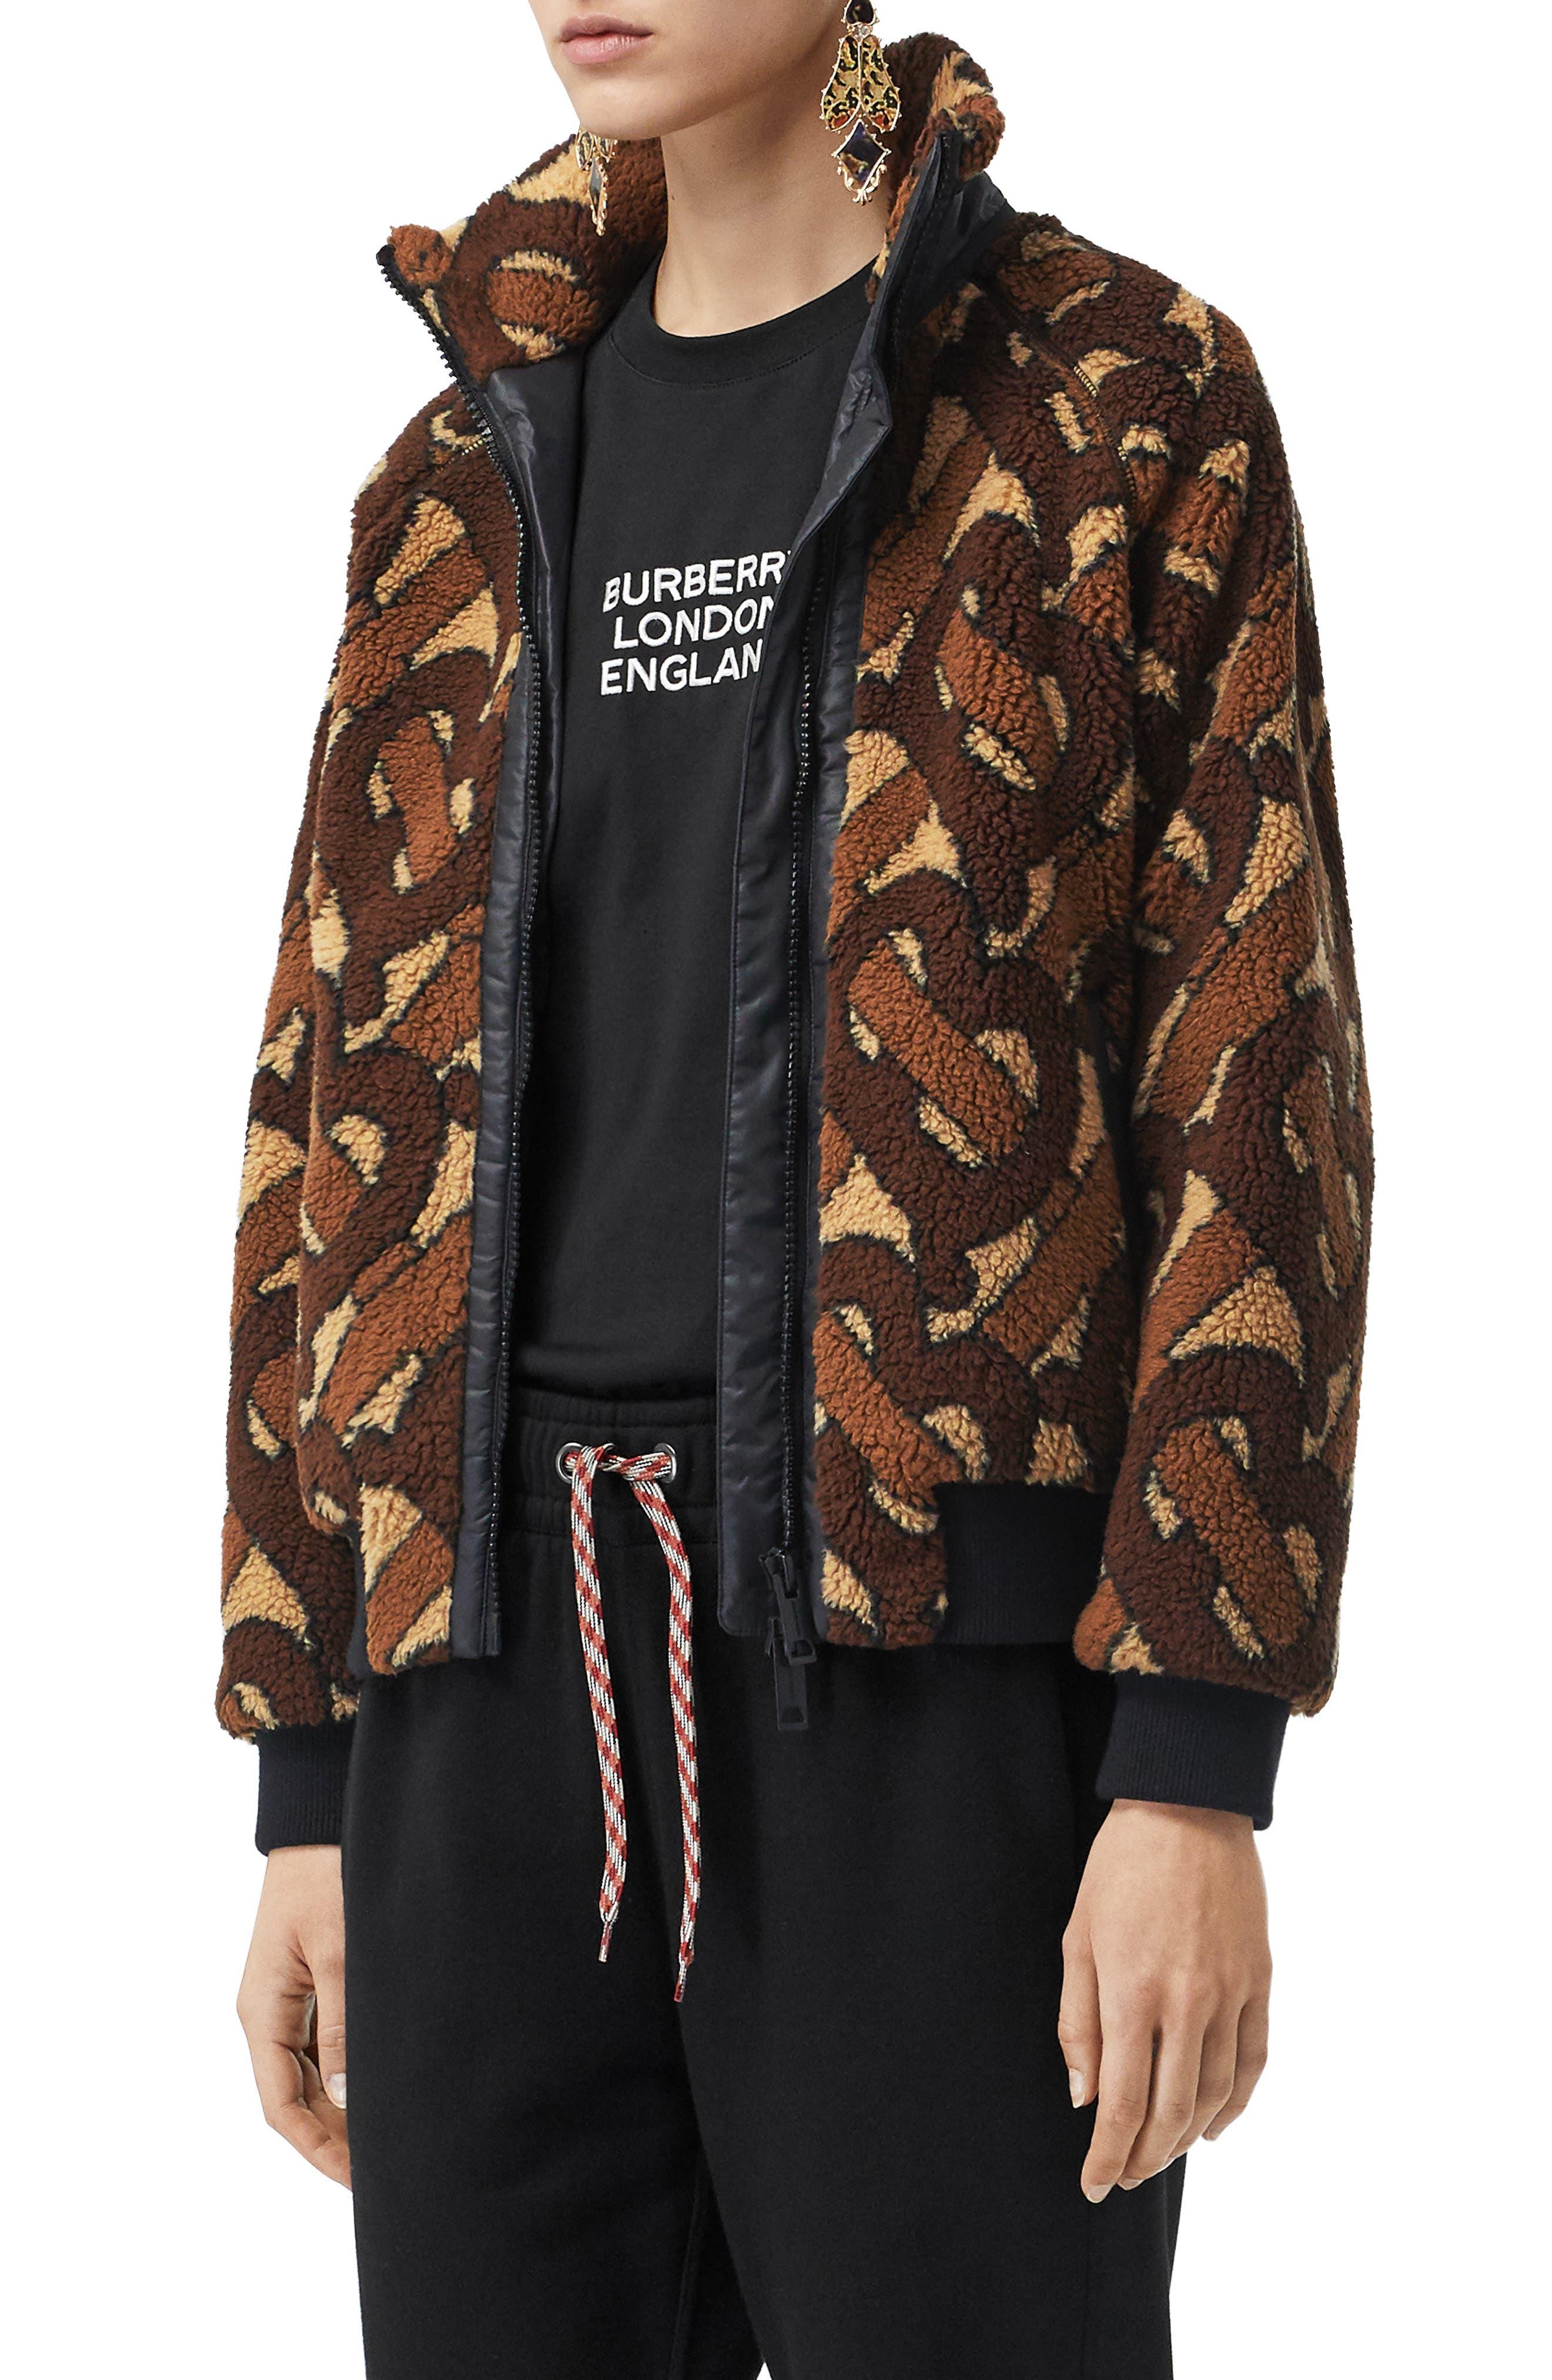 Burberry Coats Large TB Logo Zip Front Fleece Jacket